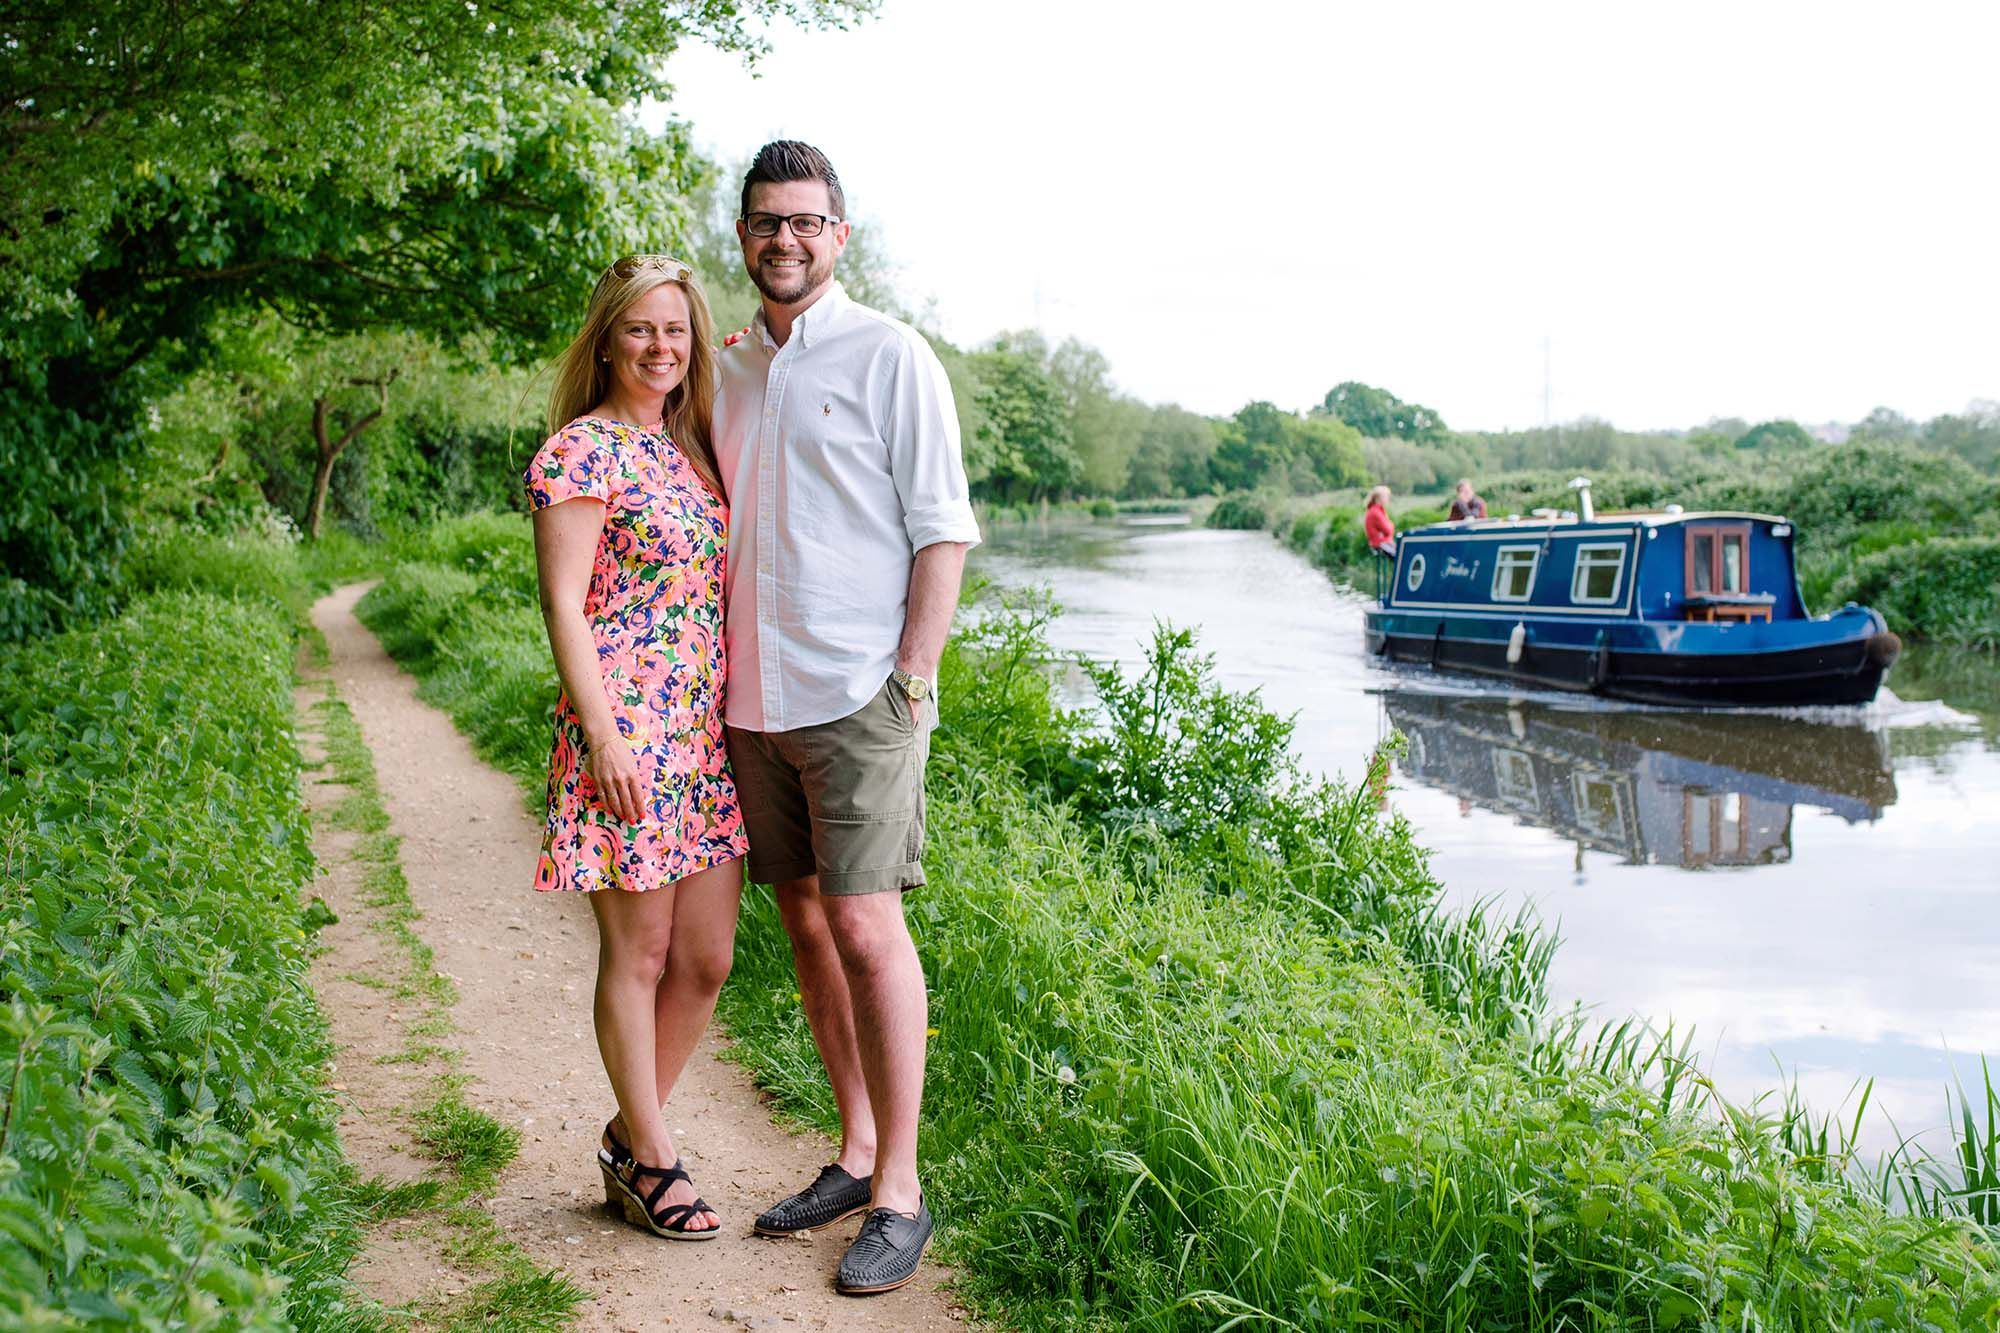 Riverside Engagement Shoot in Guildford, Surrey